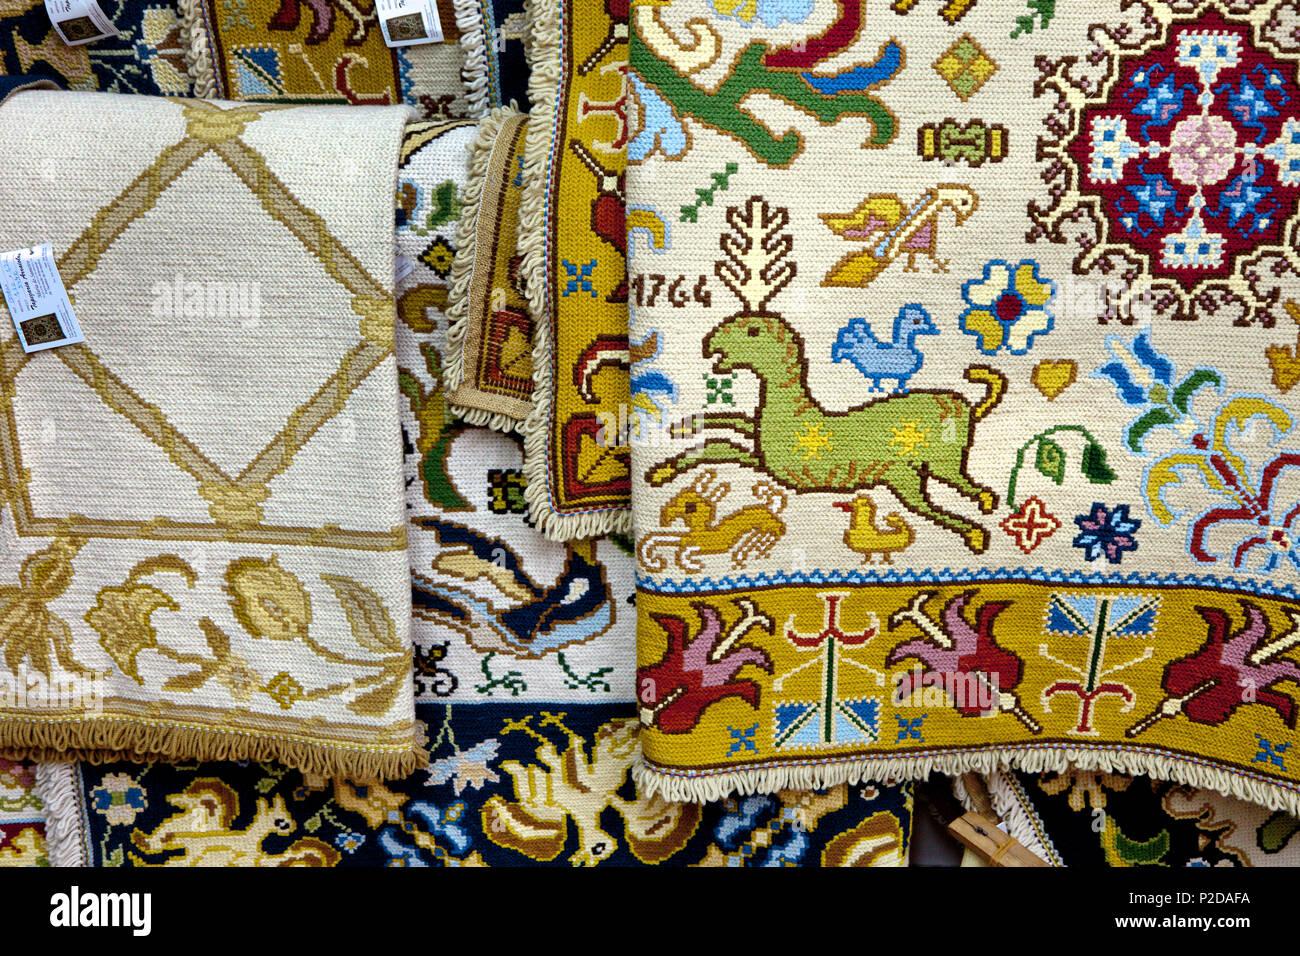 Traditional handmade carpets, Arraiolos, Alentejo, Portugal - Stock Image